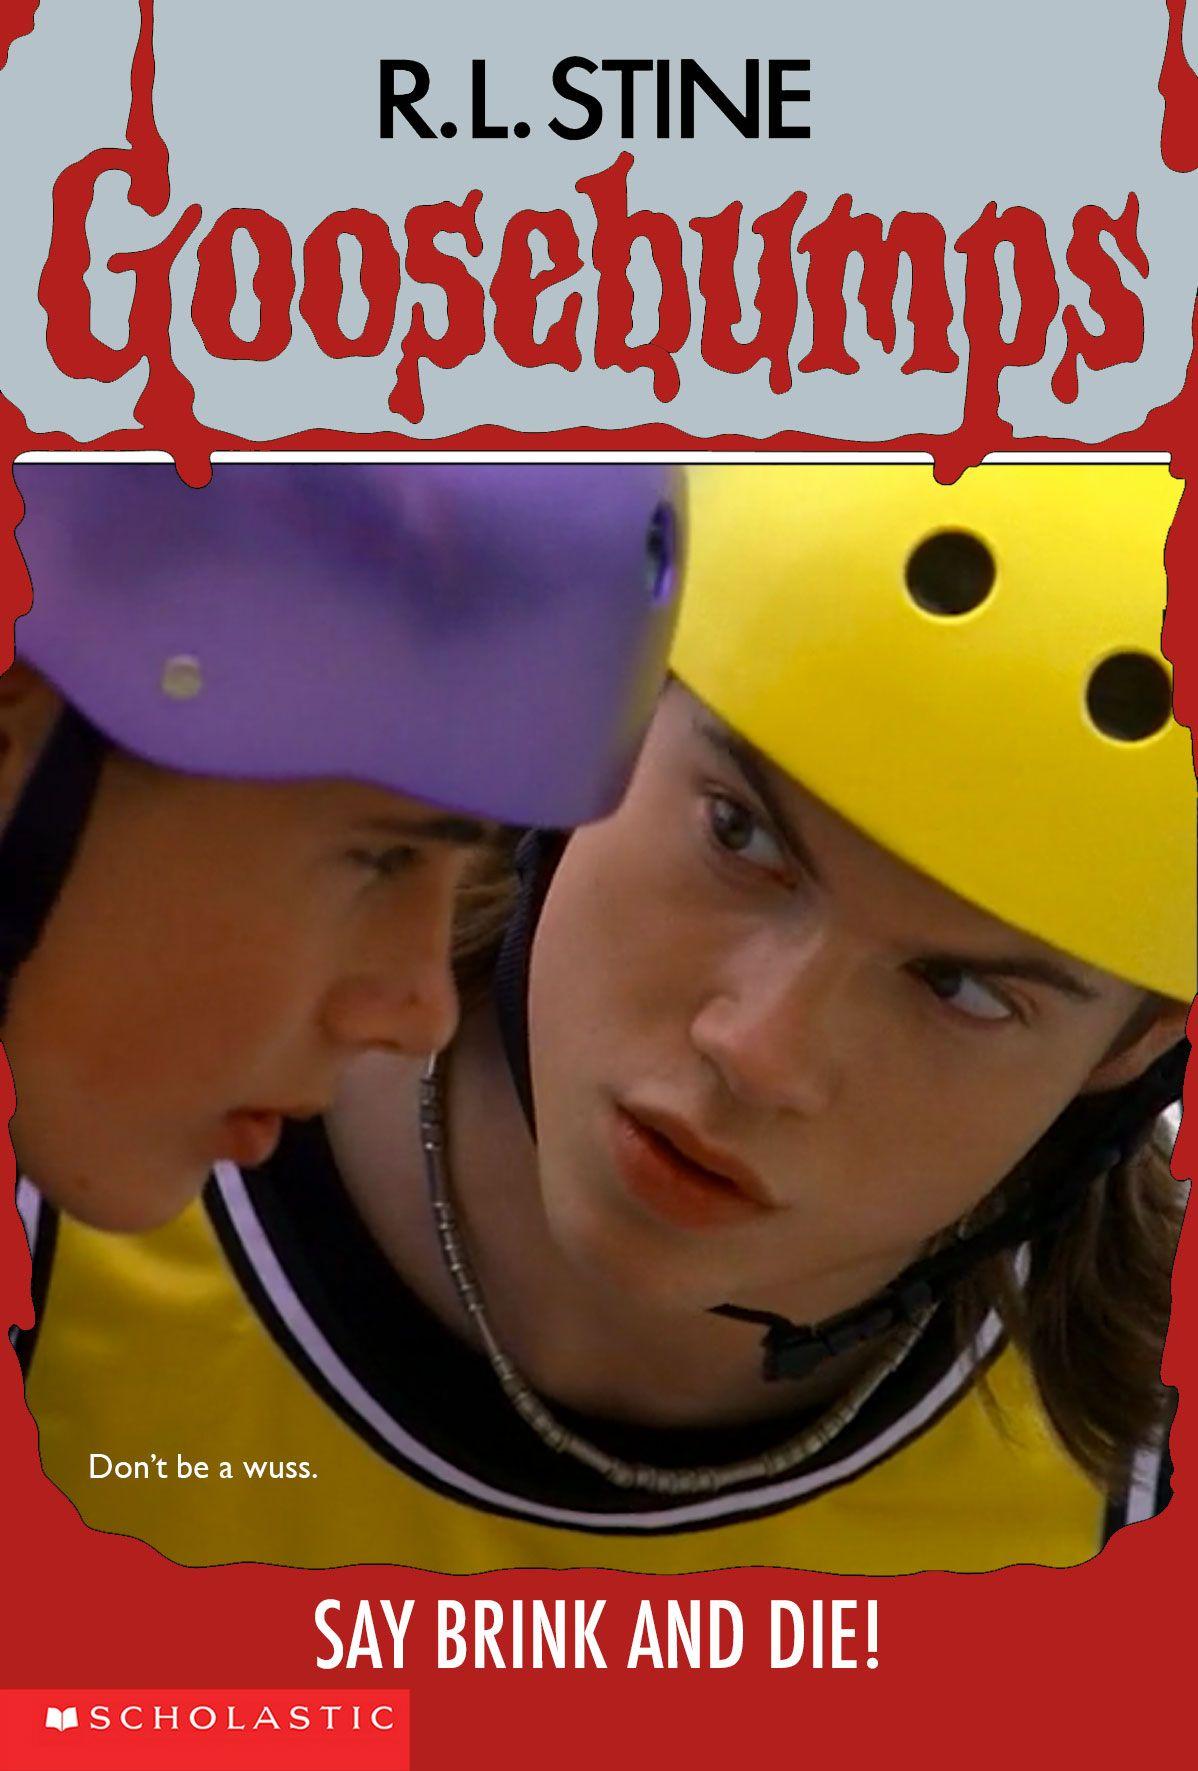 DCOMs Goosebumps Brink! Disney Channel